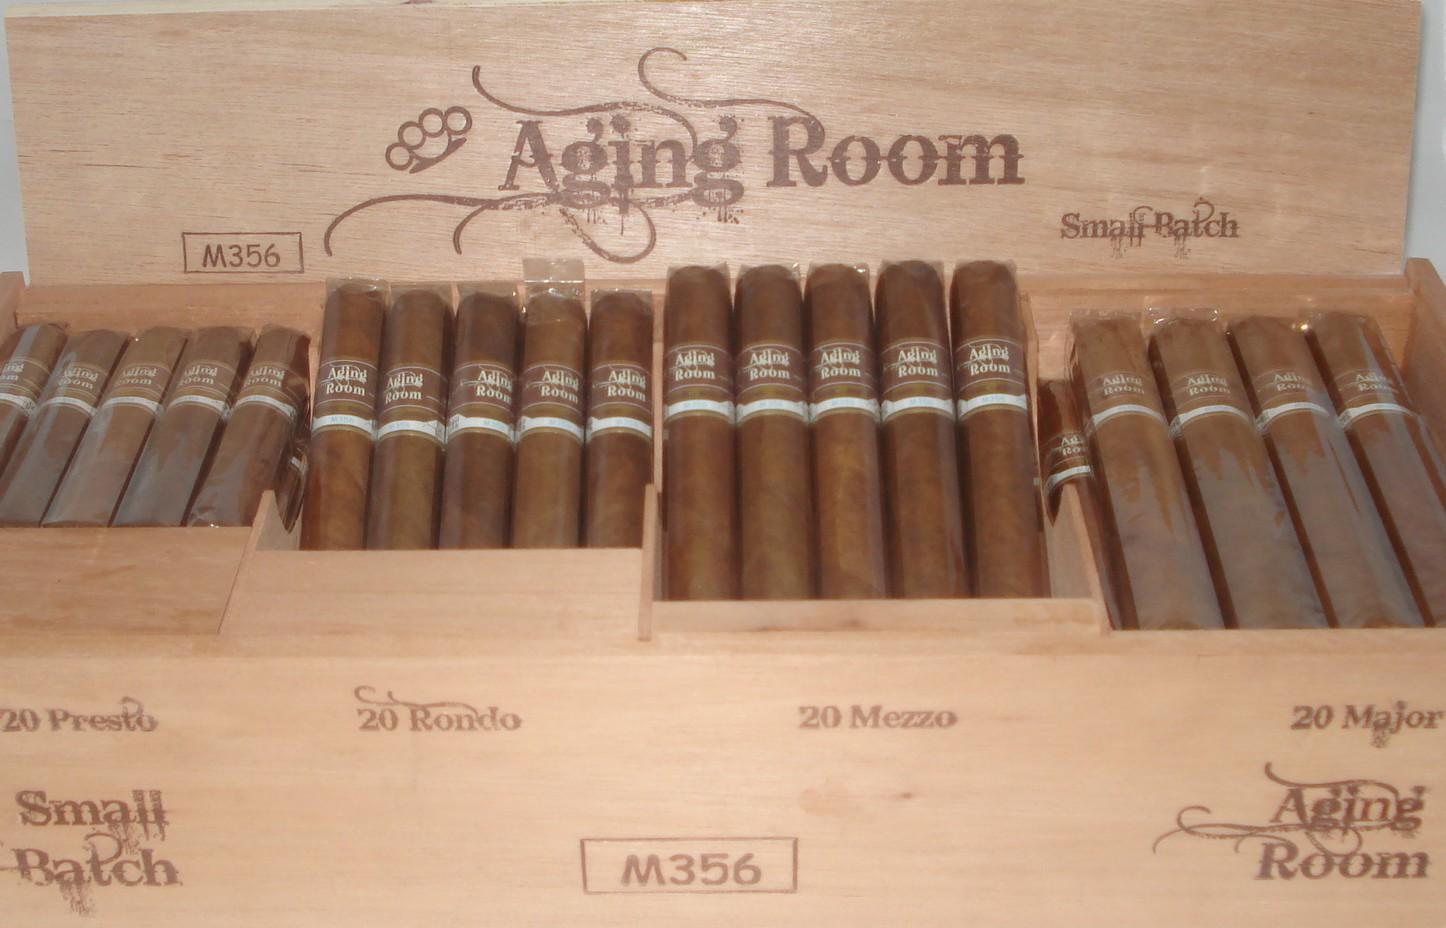 Aging Room m356 Mezzo